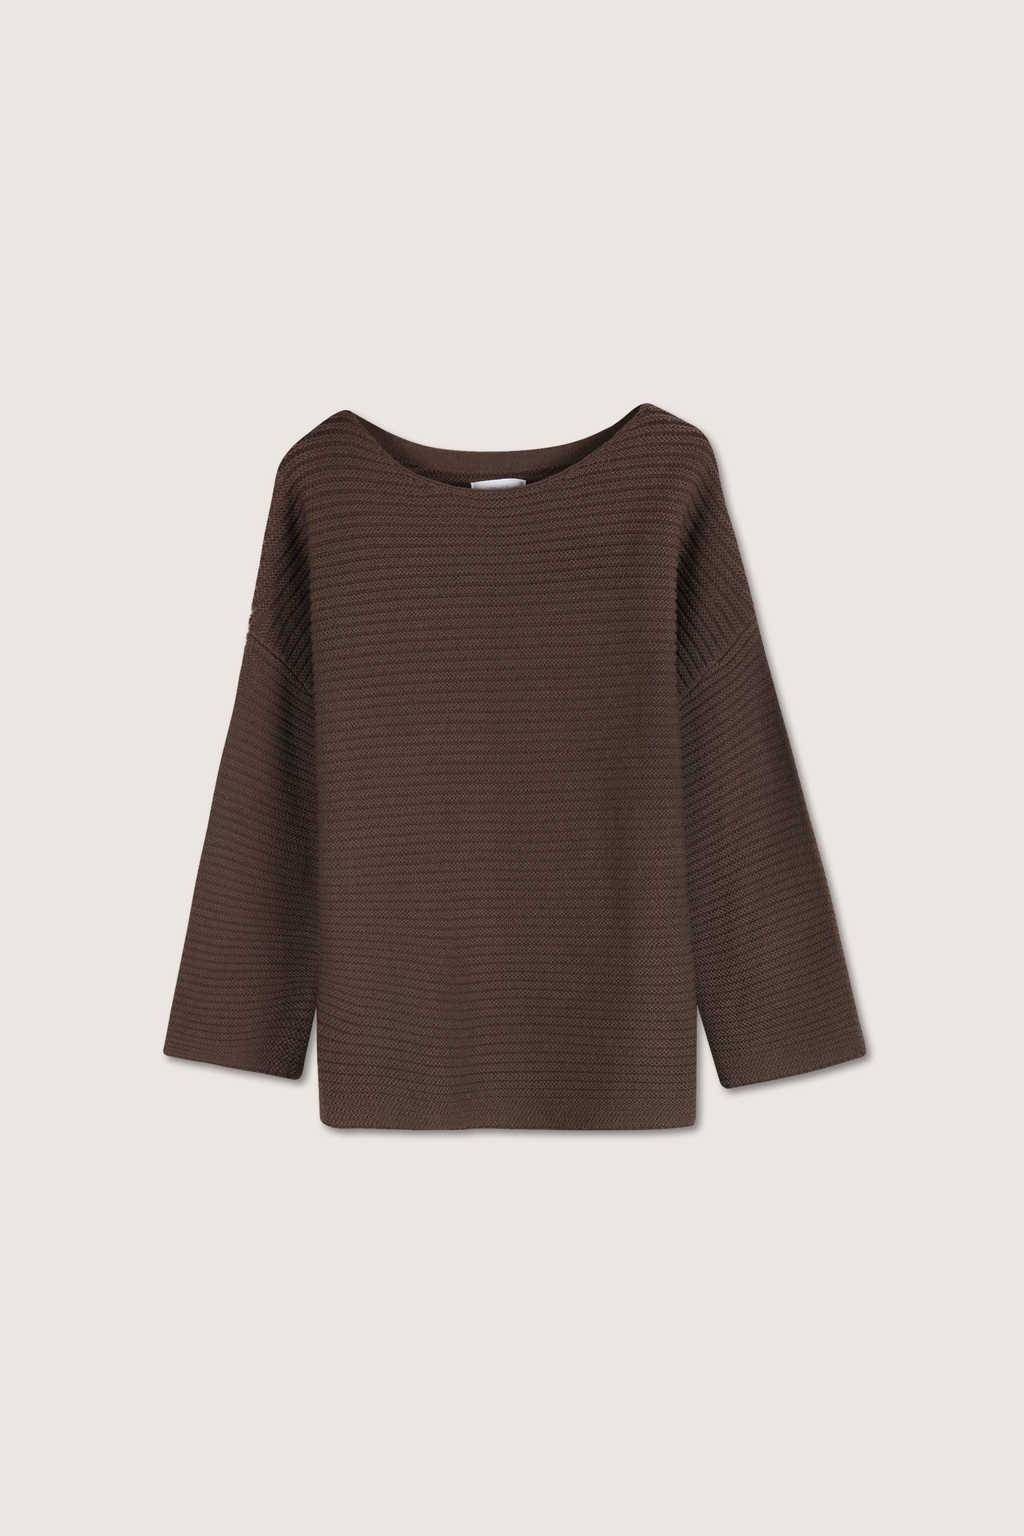 Sweater 1829 Brown 9